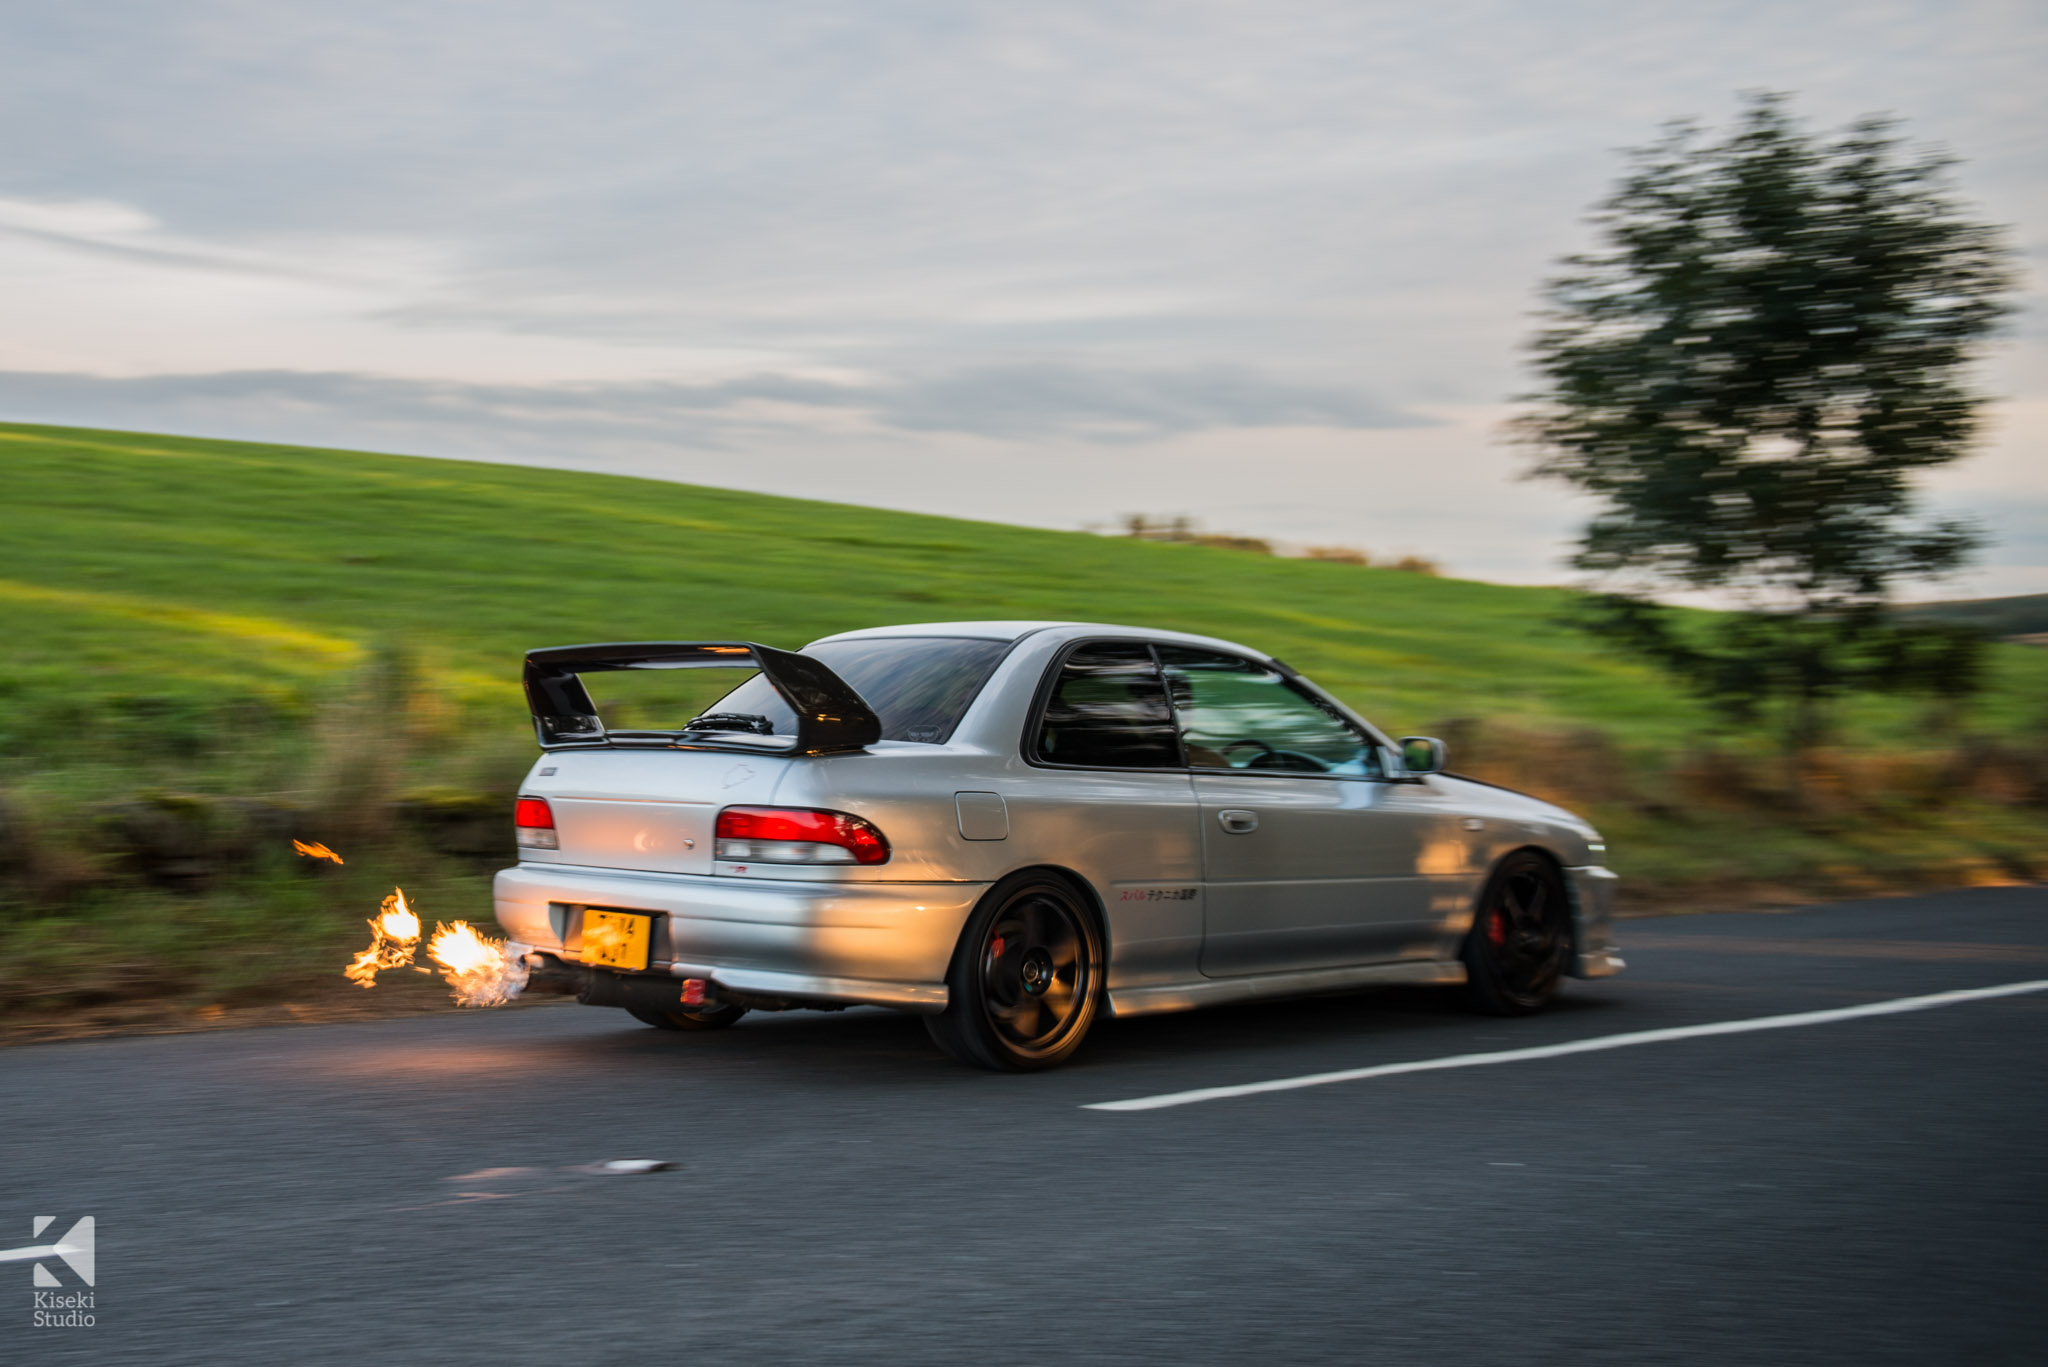 Subaru Impreza STI Type R GC8 Flaming